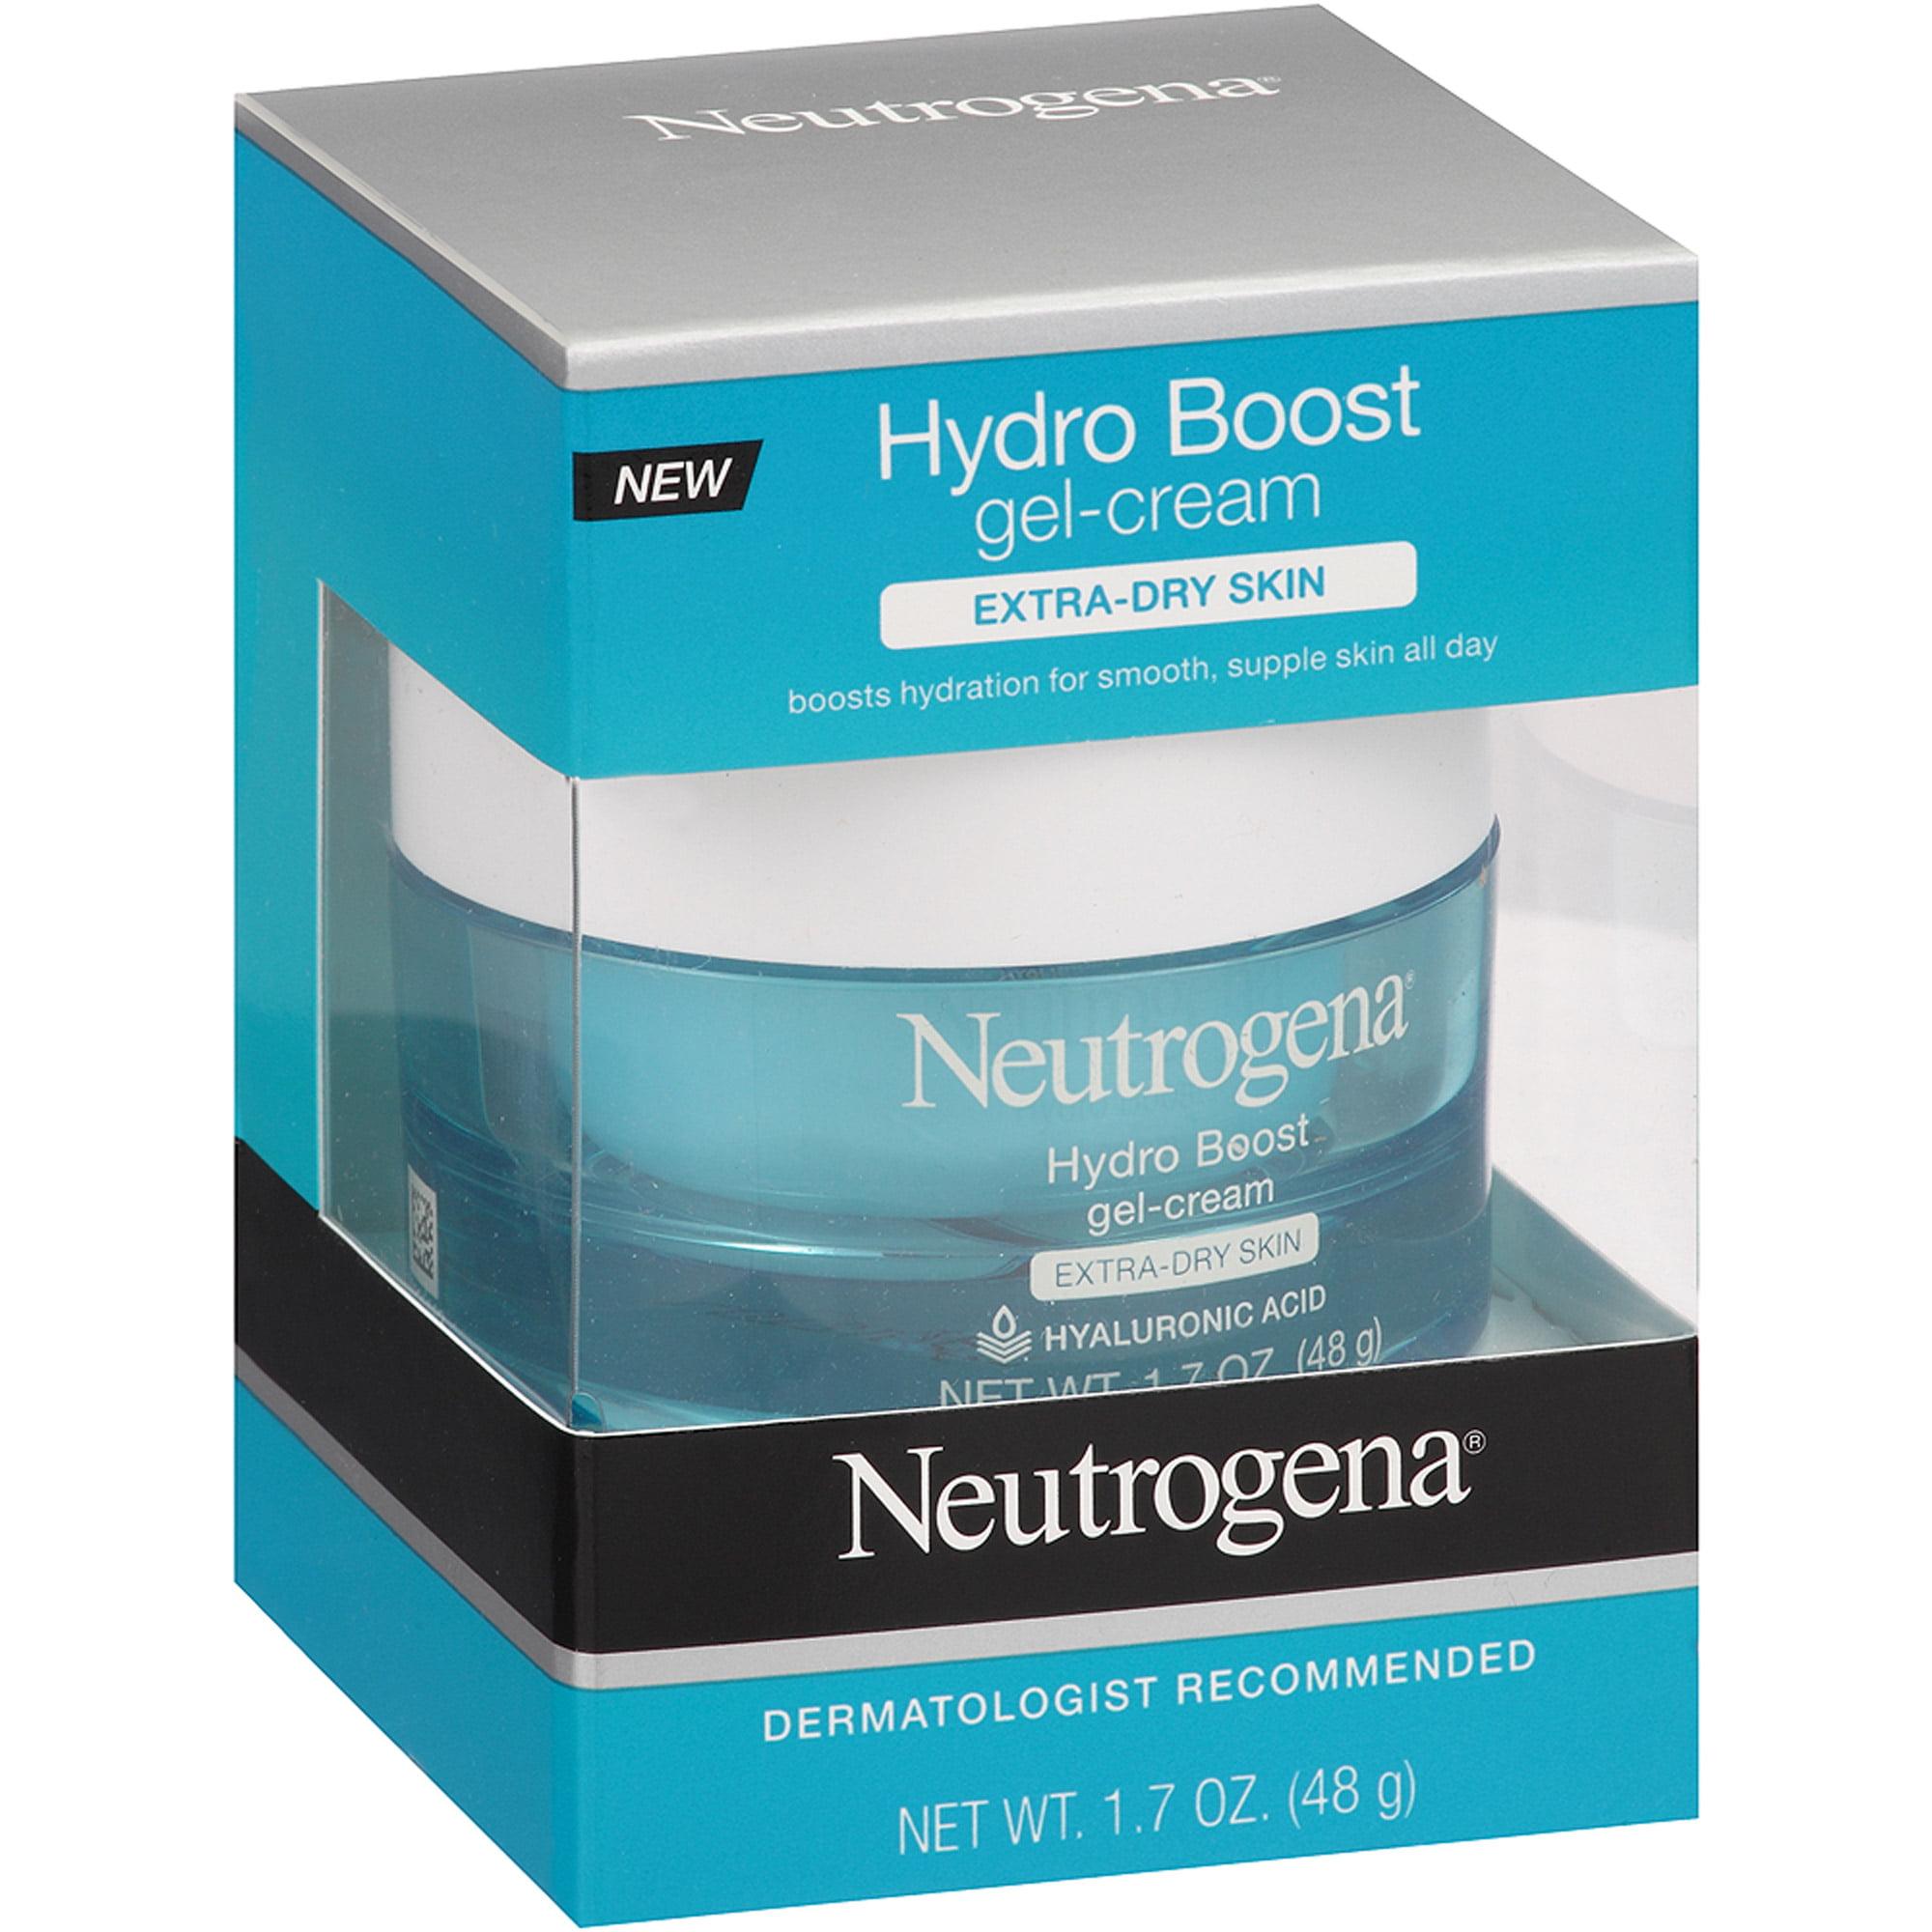 Neutrogena Hydro Boost Gel-Cream for Extra Dry Skin, 1.7 oz